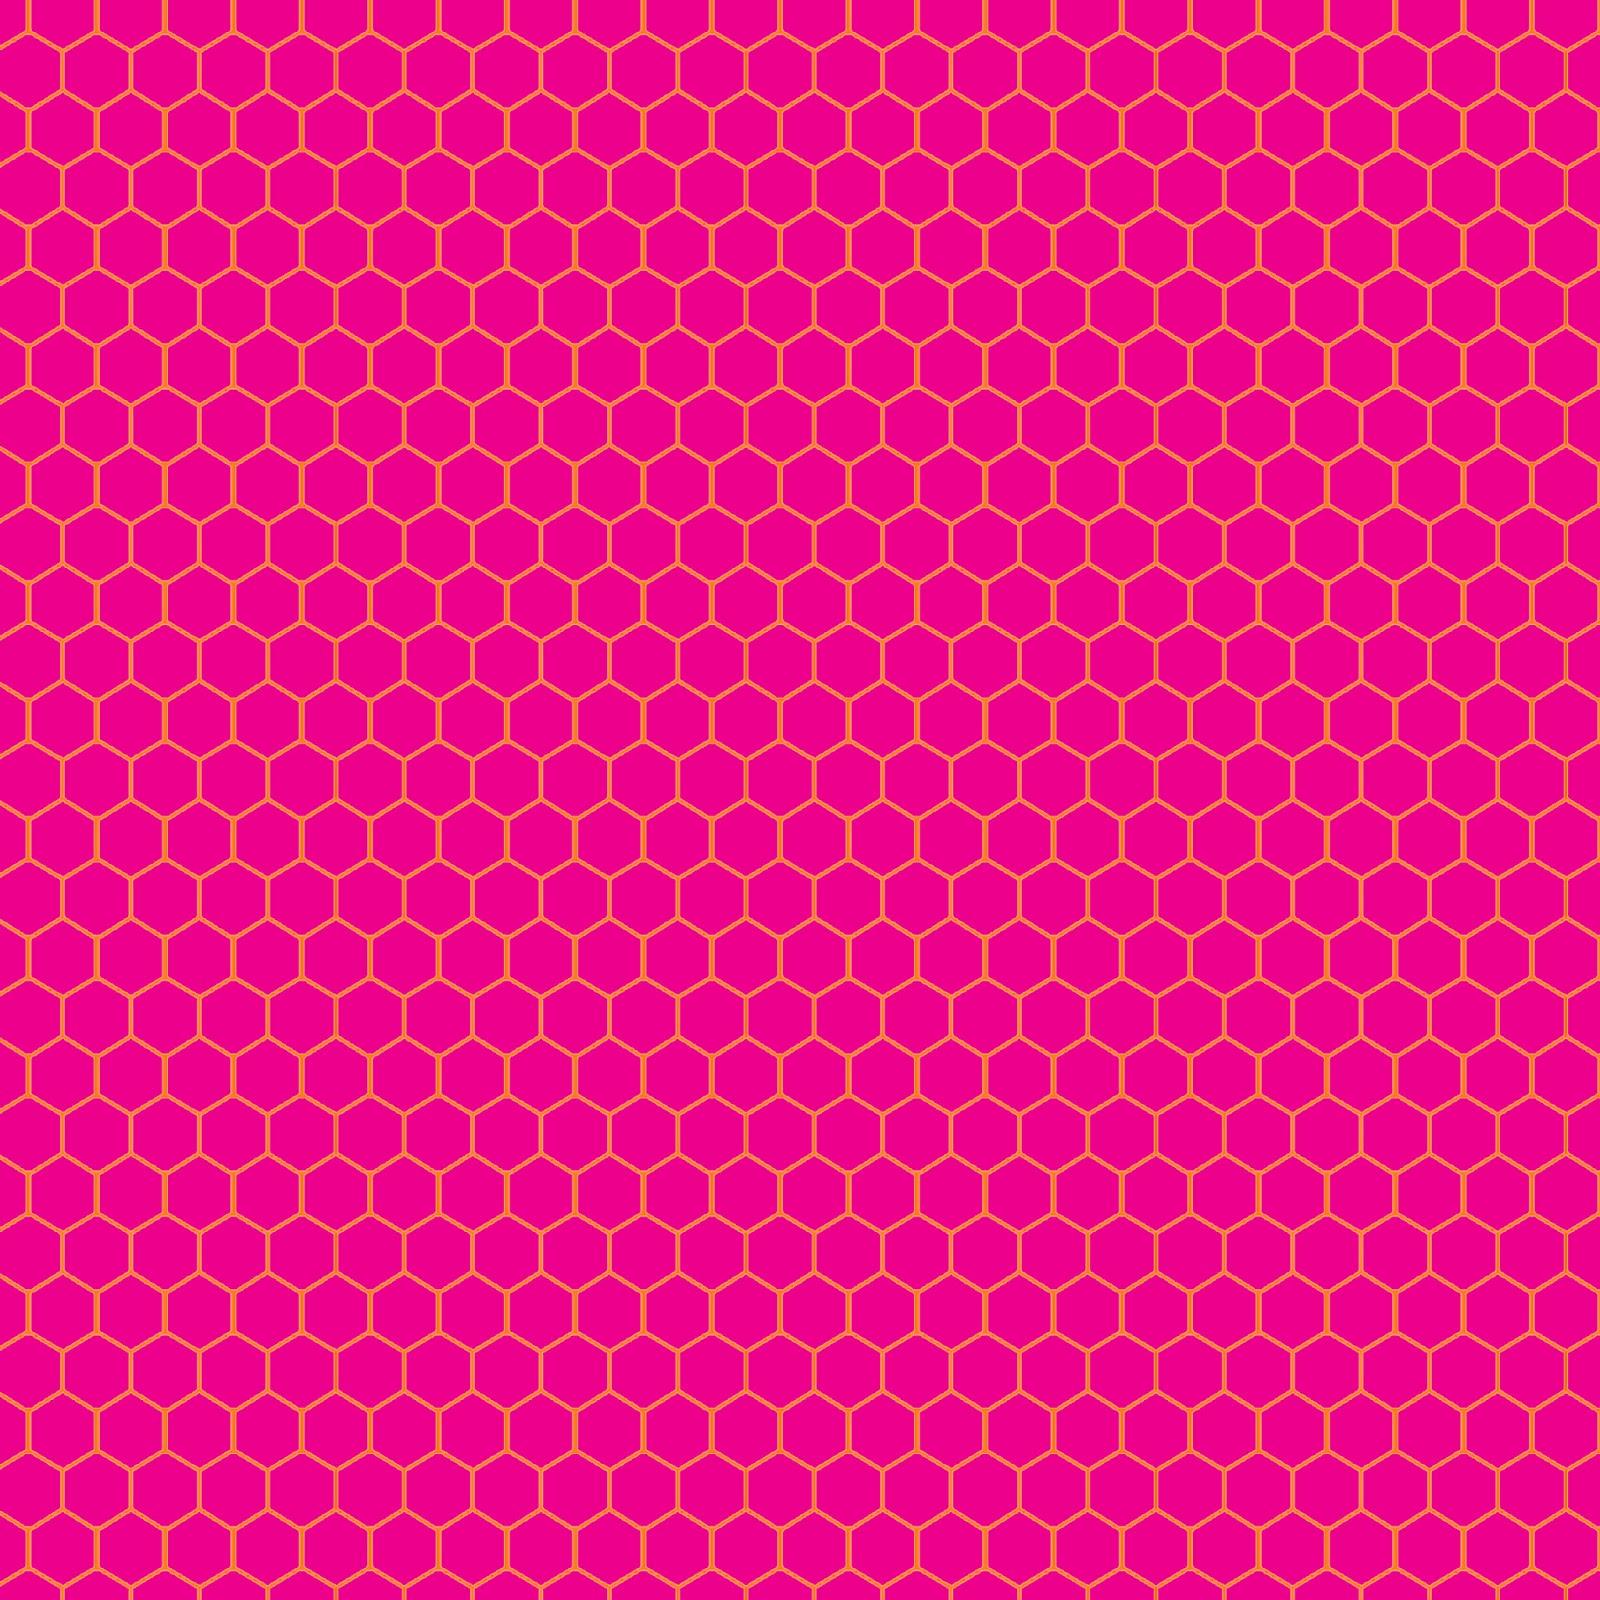 Wallpaper Black Pink: Hexagon Honeycomb FREEBIE Background Pattern Of Awesomeness